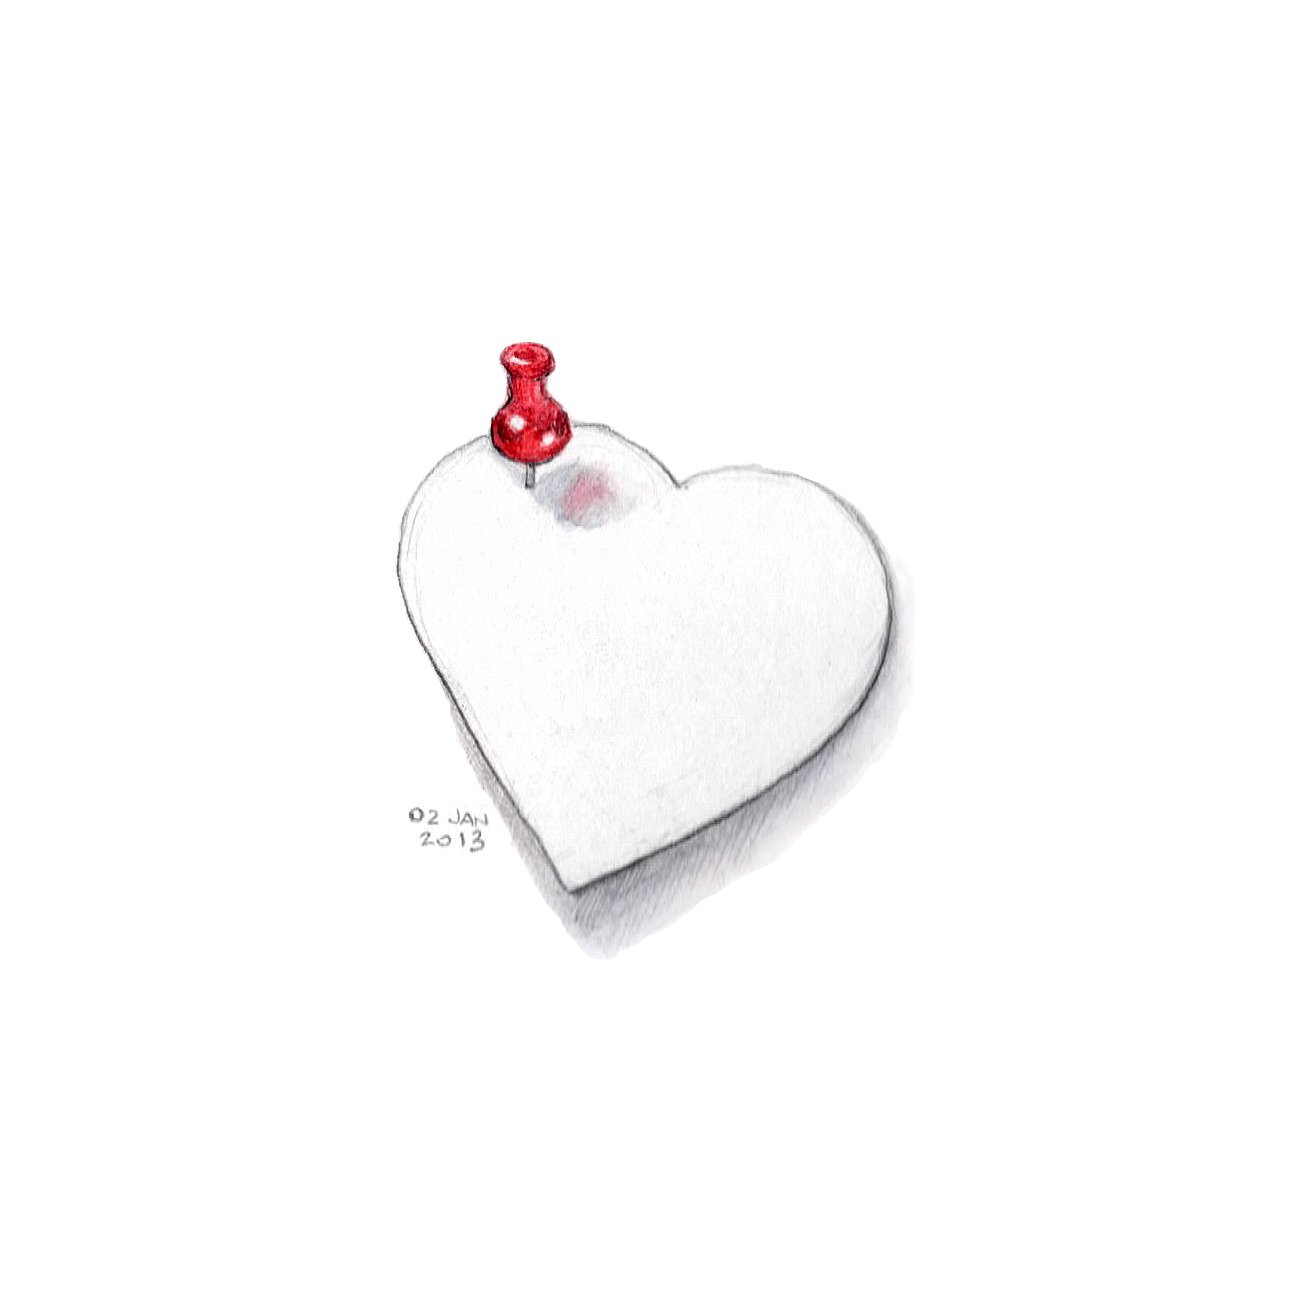 02pinned_heart.jpg